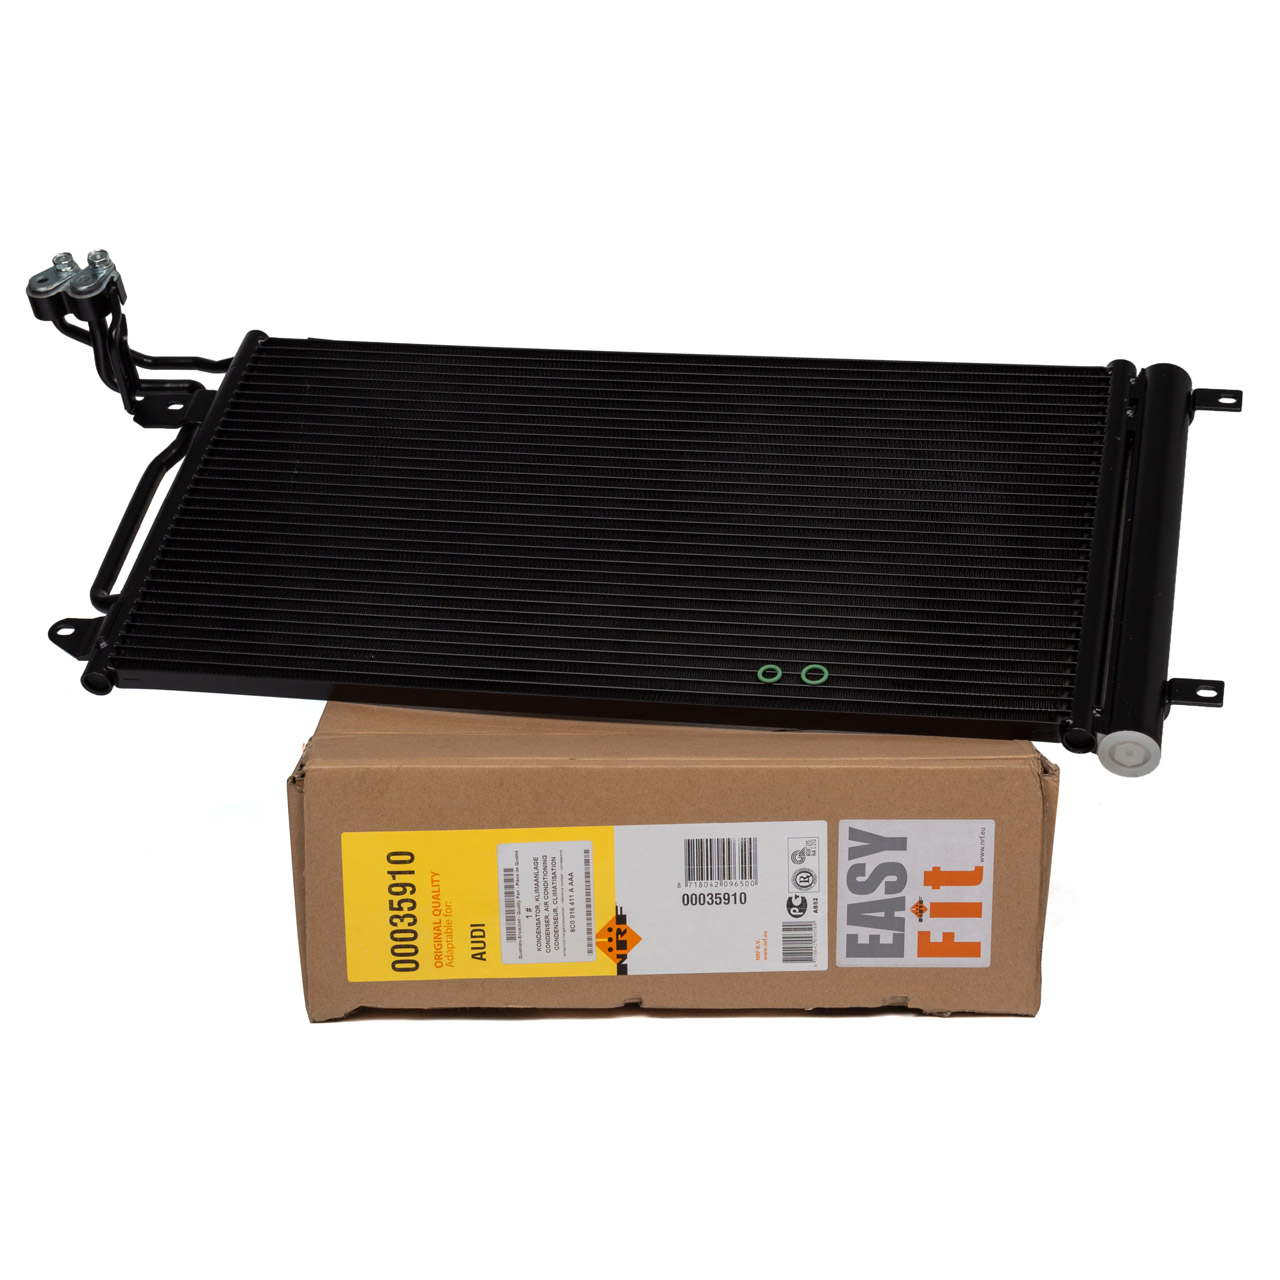 NRF Kondensator Klima EASY FIT VW Polo 6R SEAT Ibiza 4 AUDI A1 SKODA Fabia 1 2 3 6R0820411